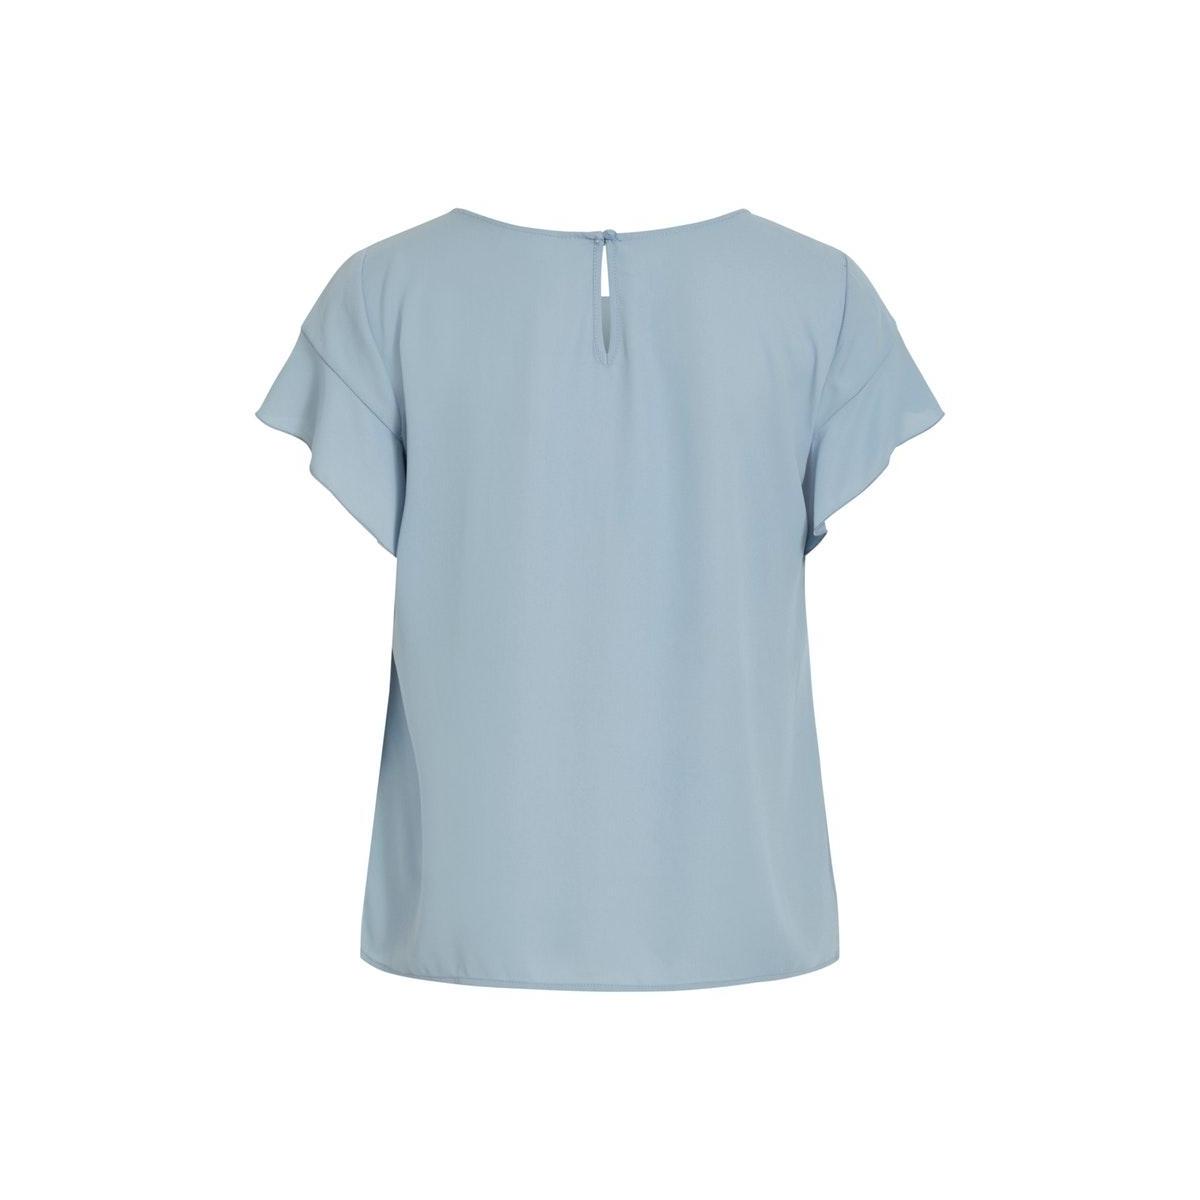 vilucy s/s flounce top - fav 14045856 vila t-shirt ashley blue